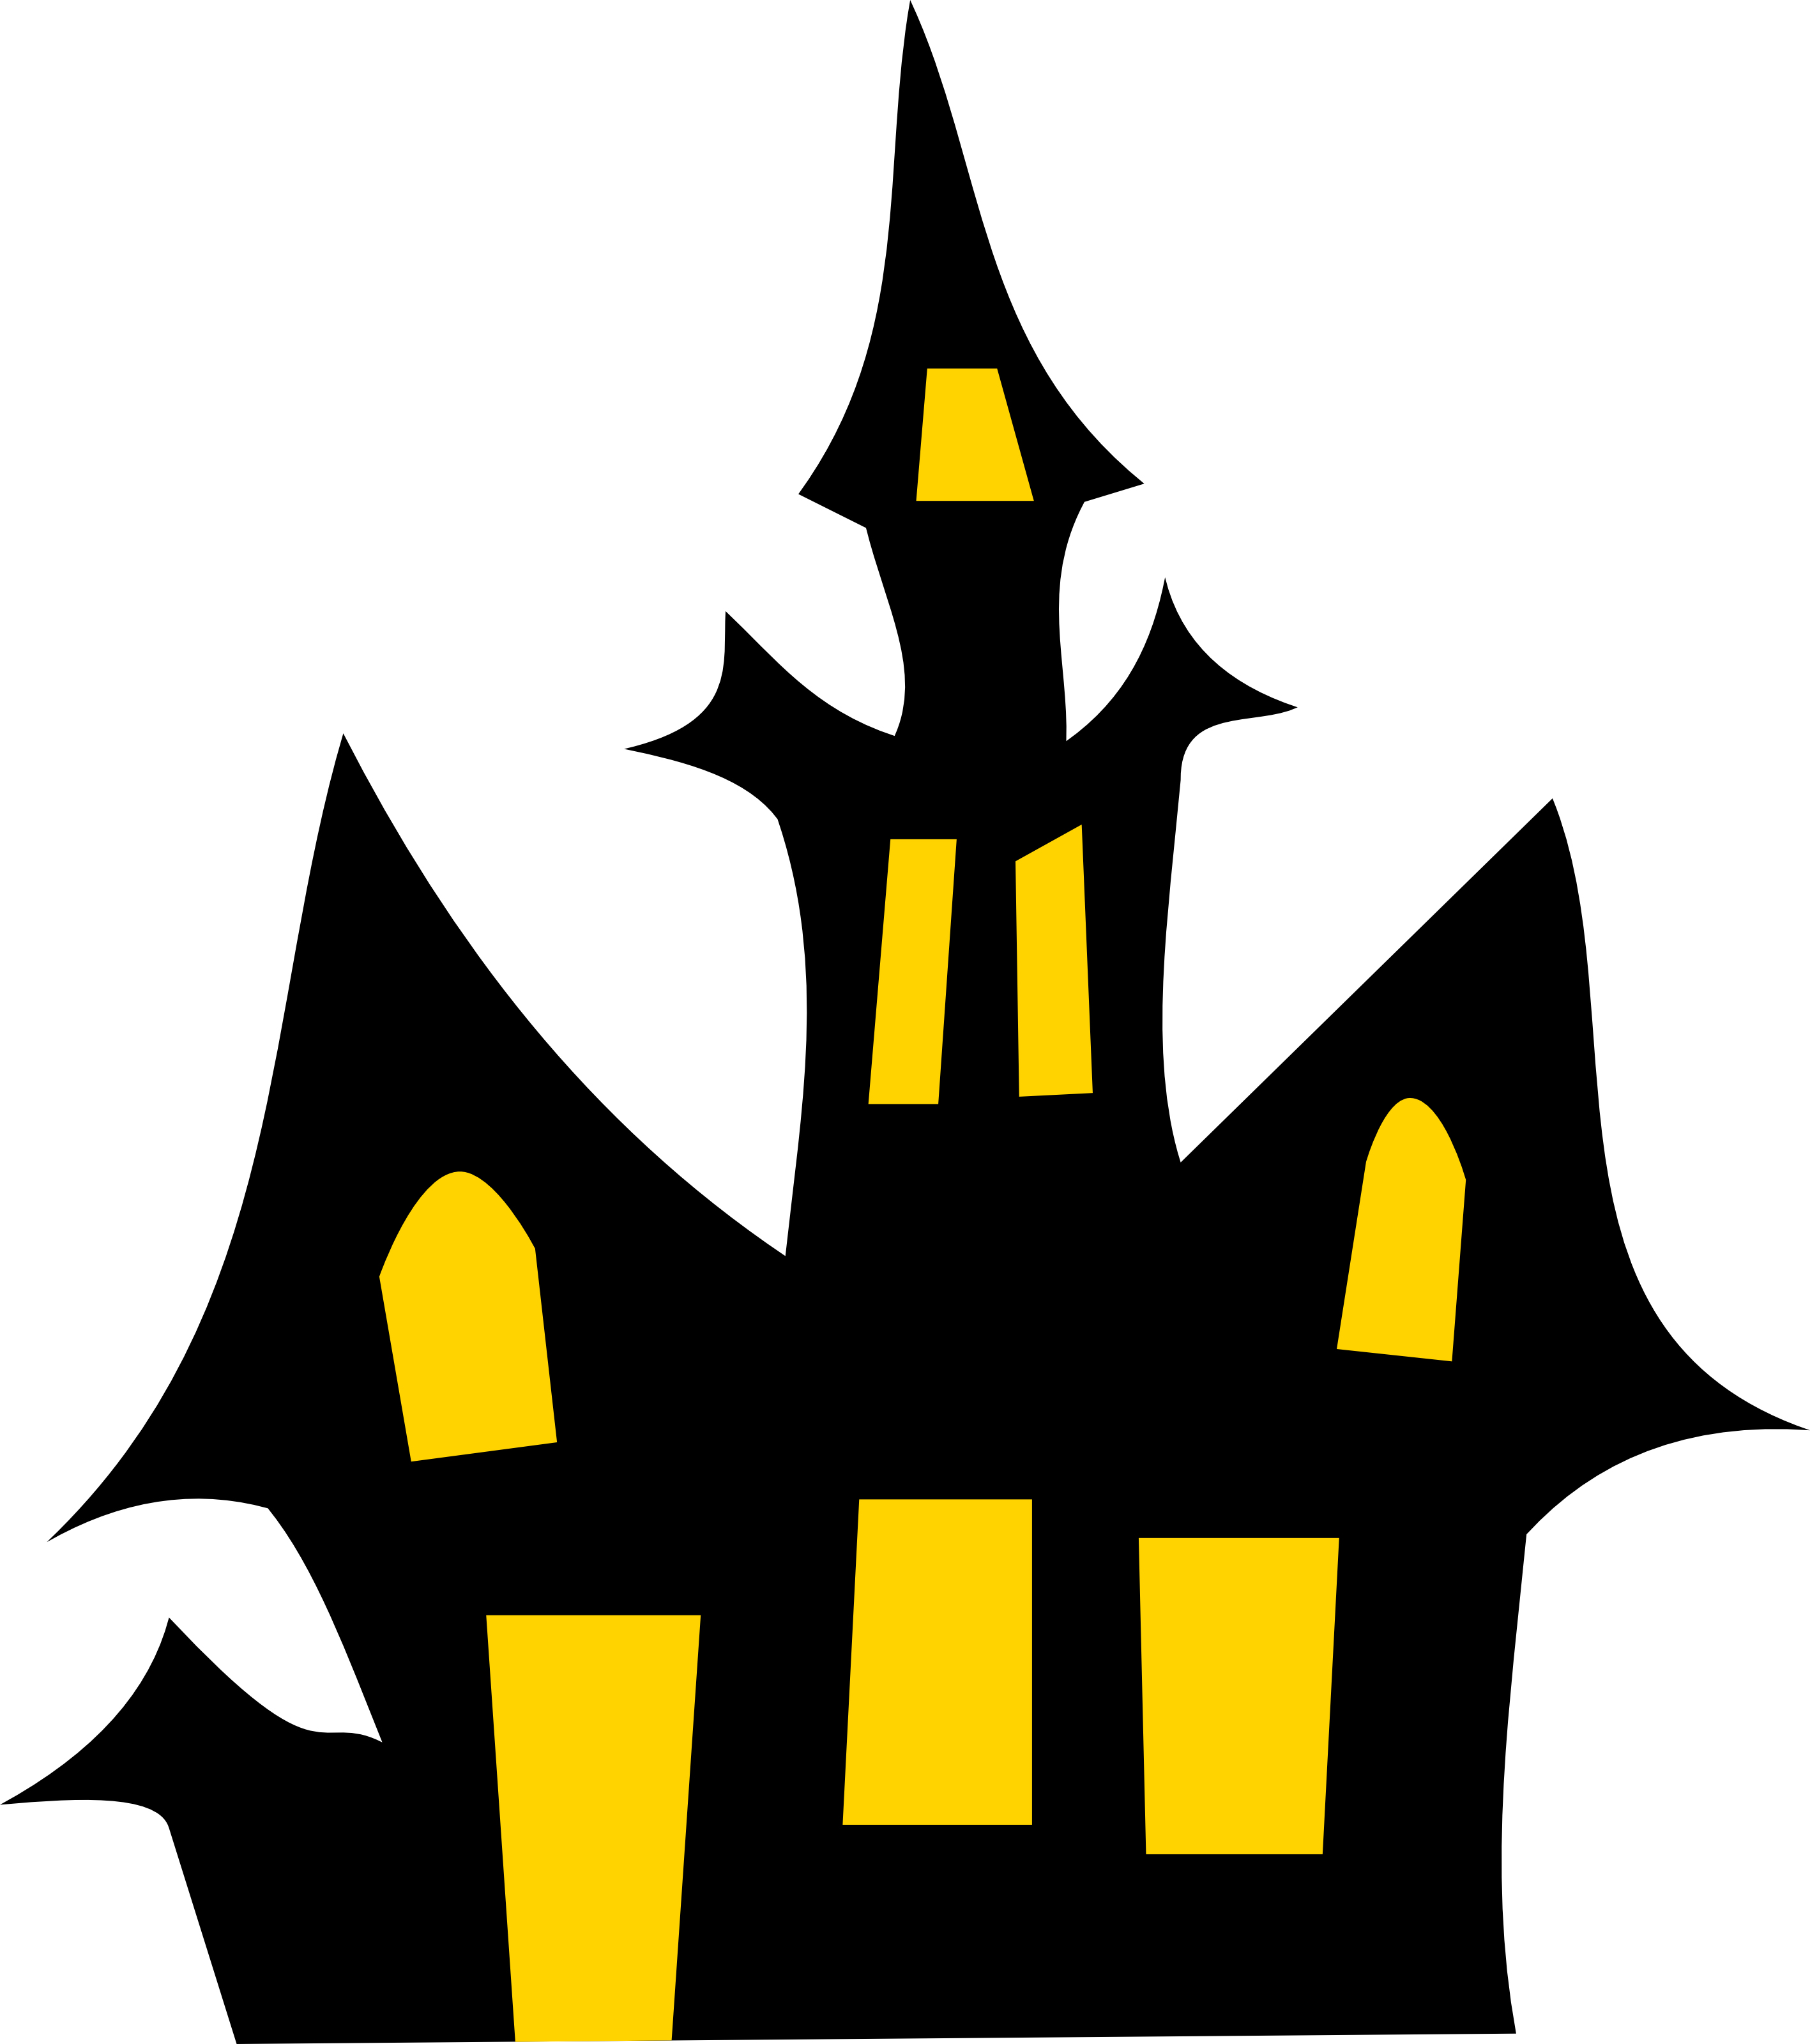 Halloween Ghost Clipart - ClipArt Best